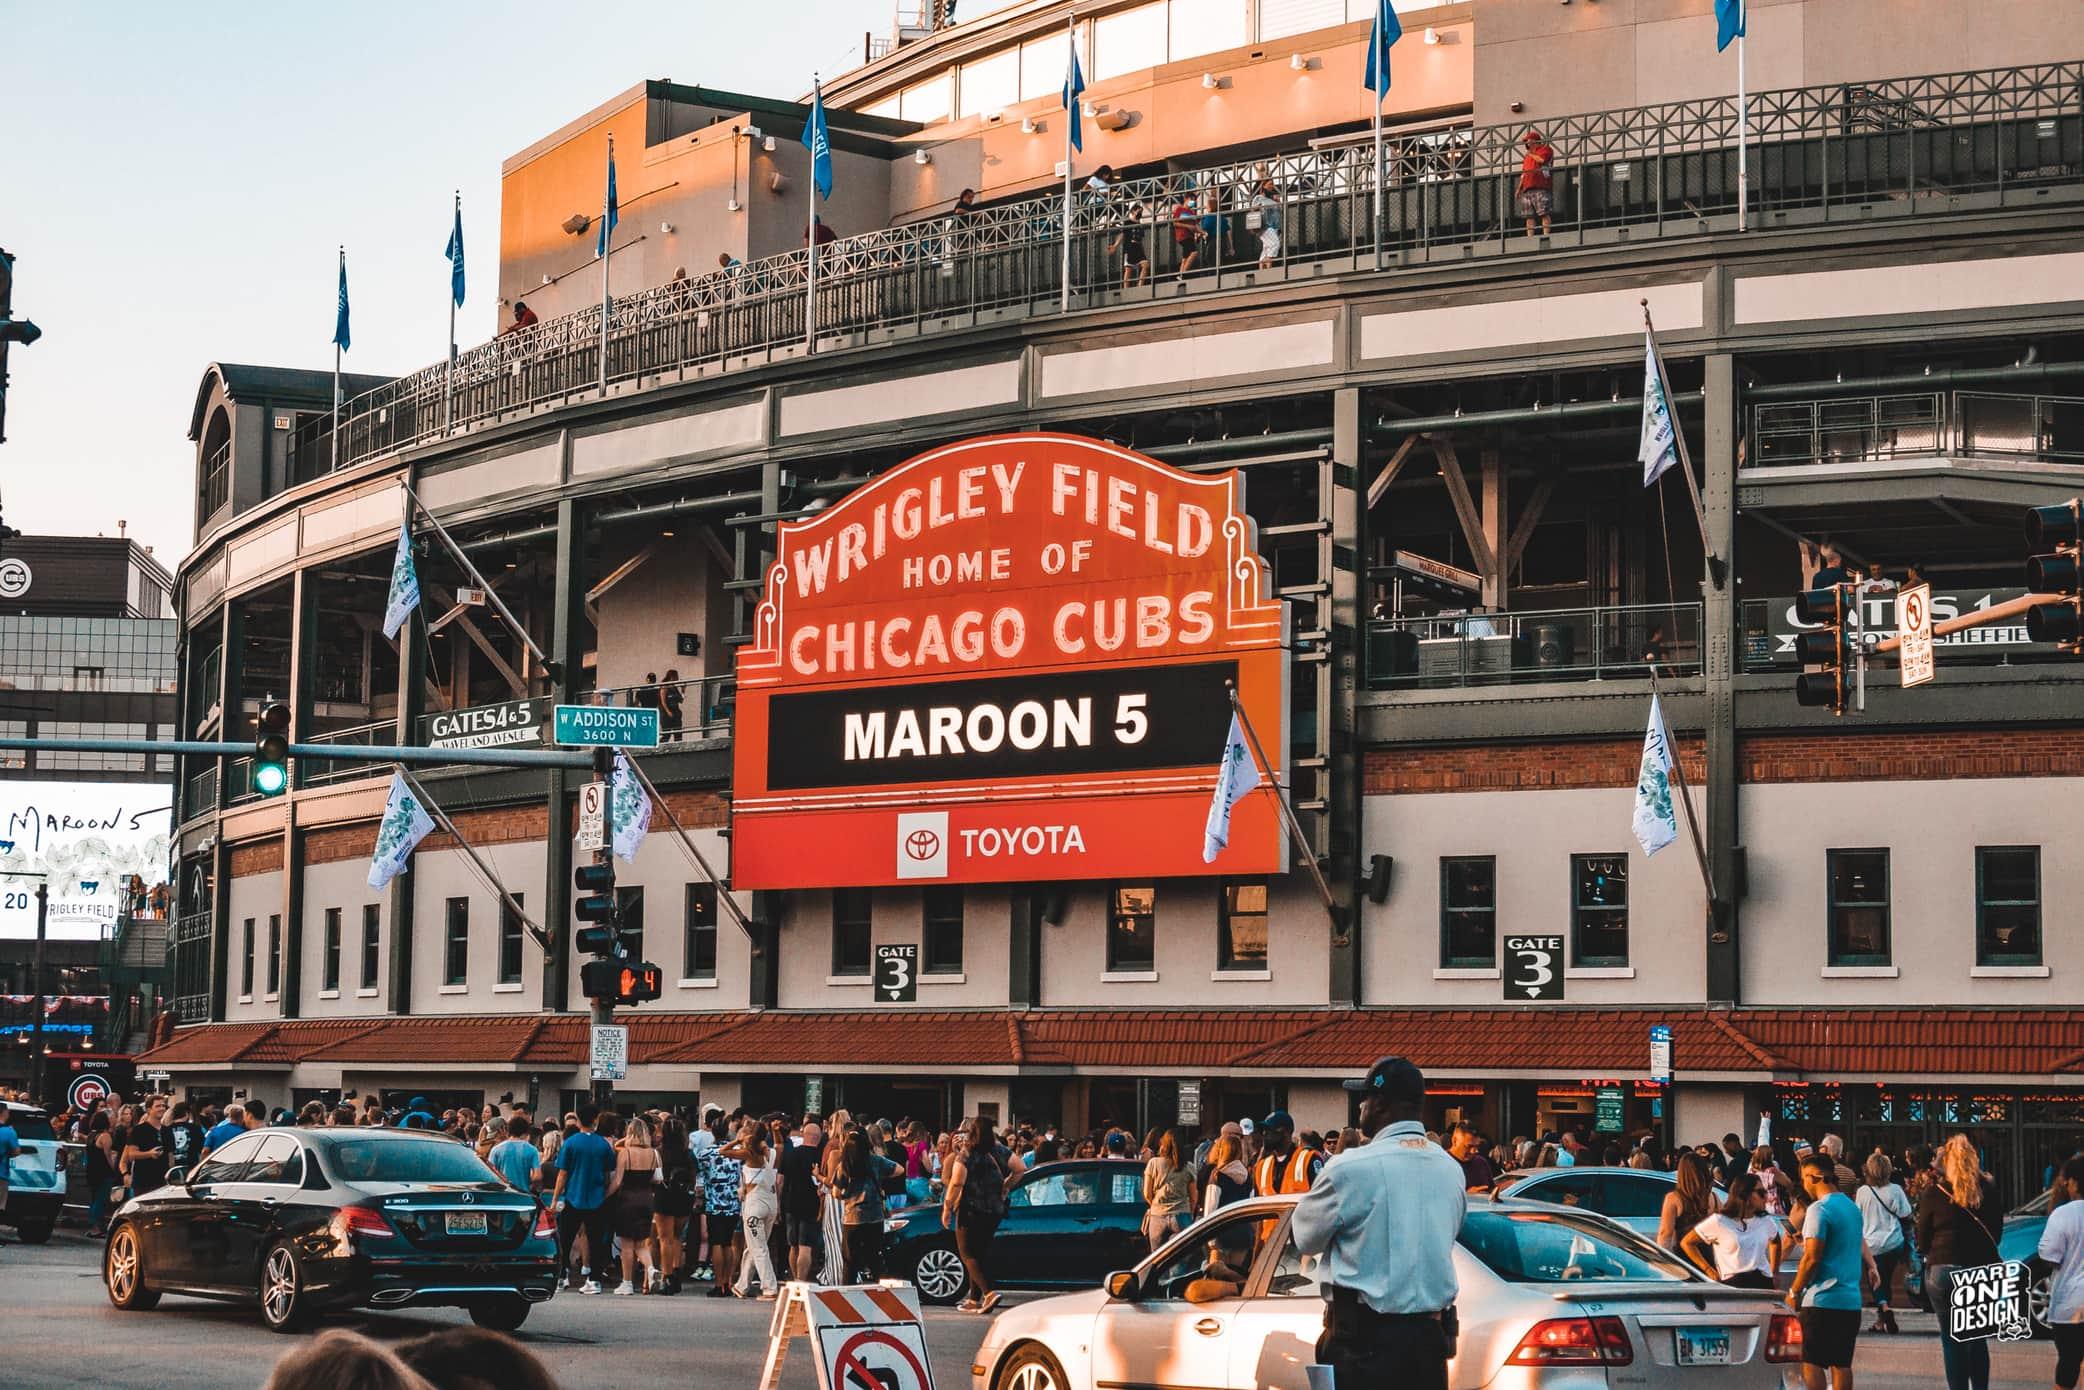 Maroon 5 Wrigley Field